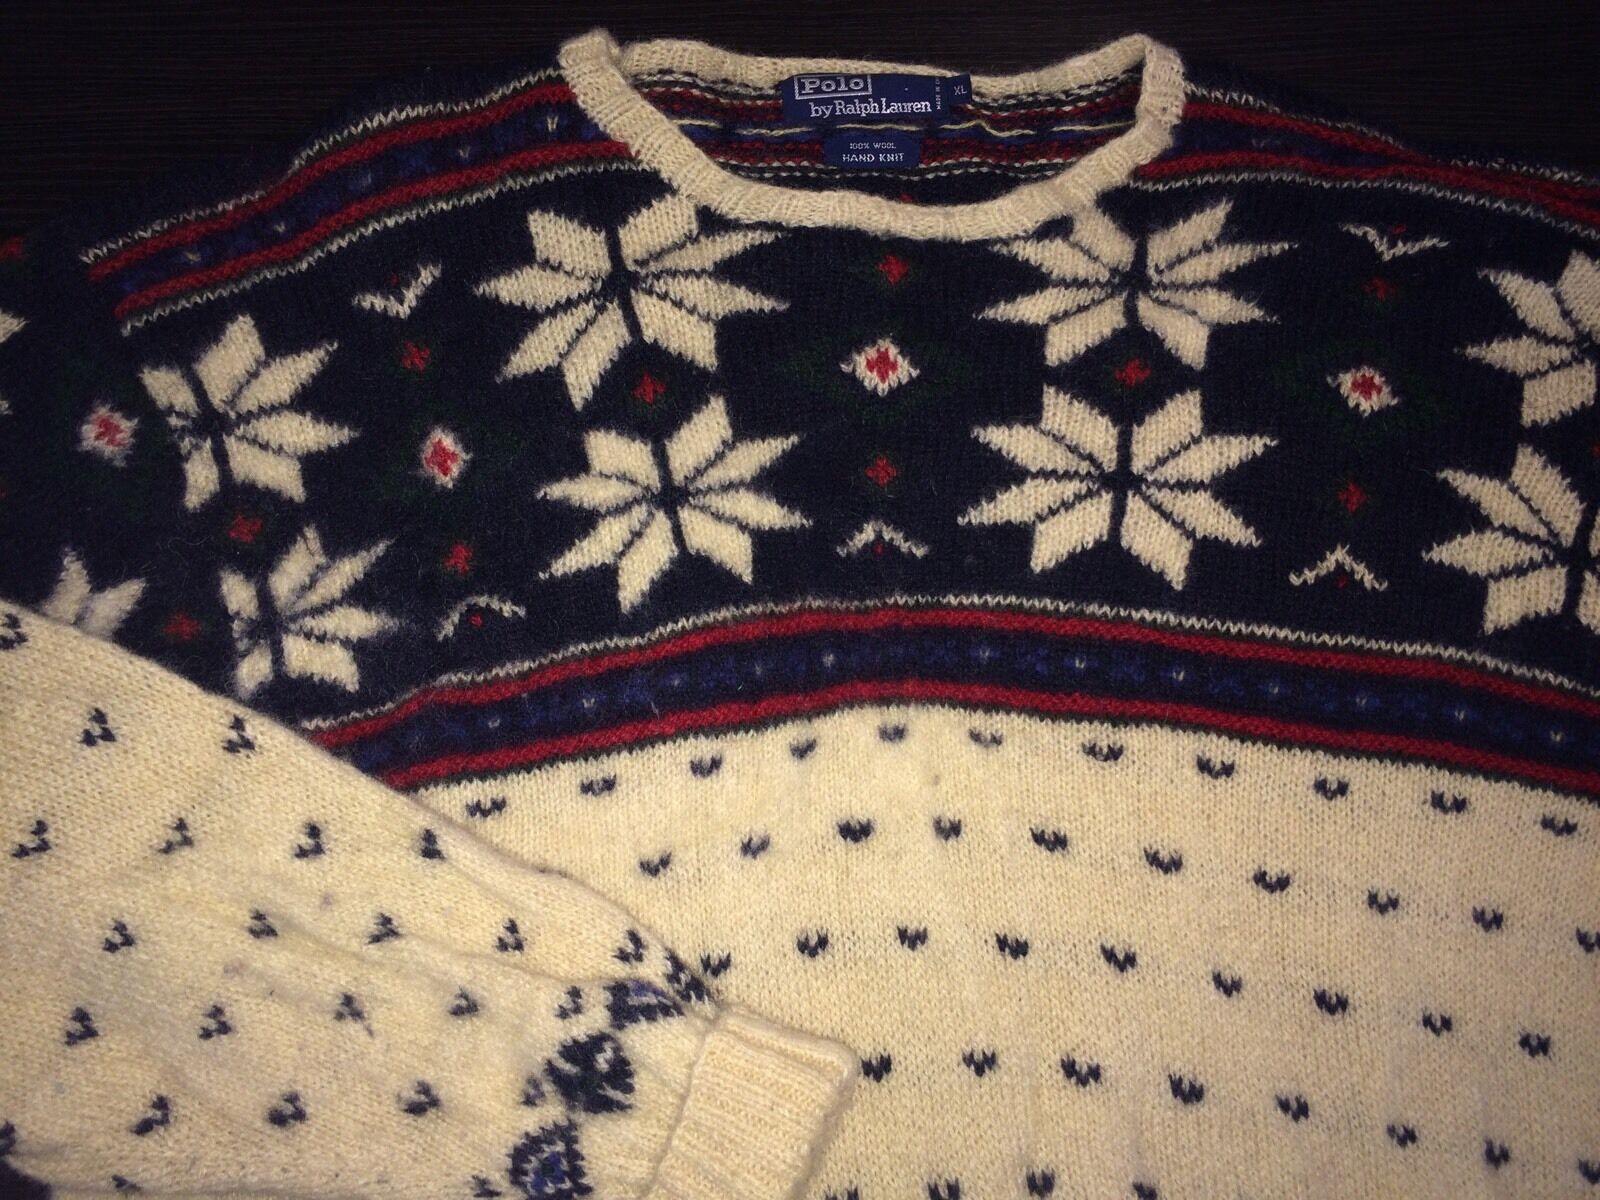 Vintage Polo Ralph Lauren 100% Wool Snowflake Wing Sweater HandKnit XL Used